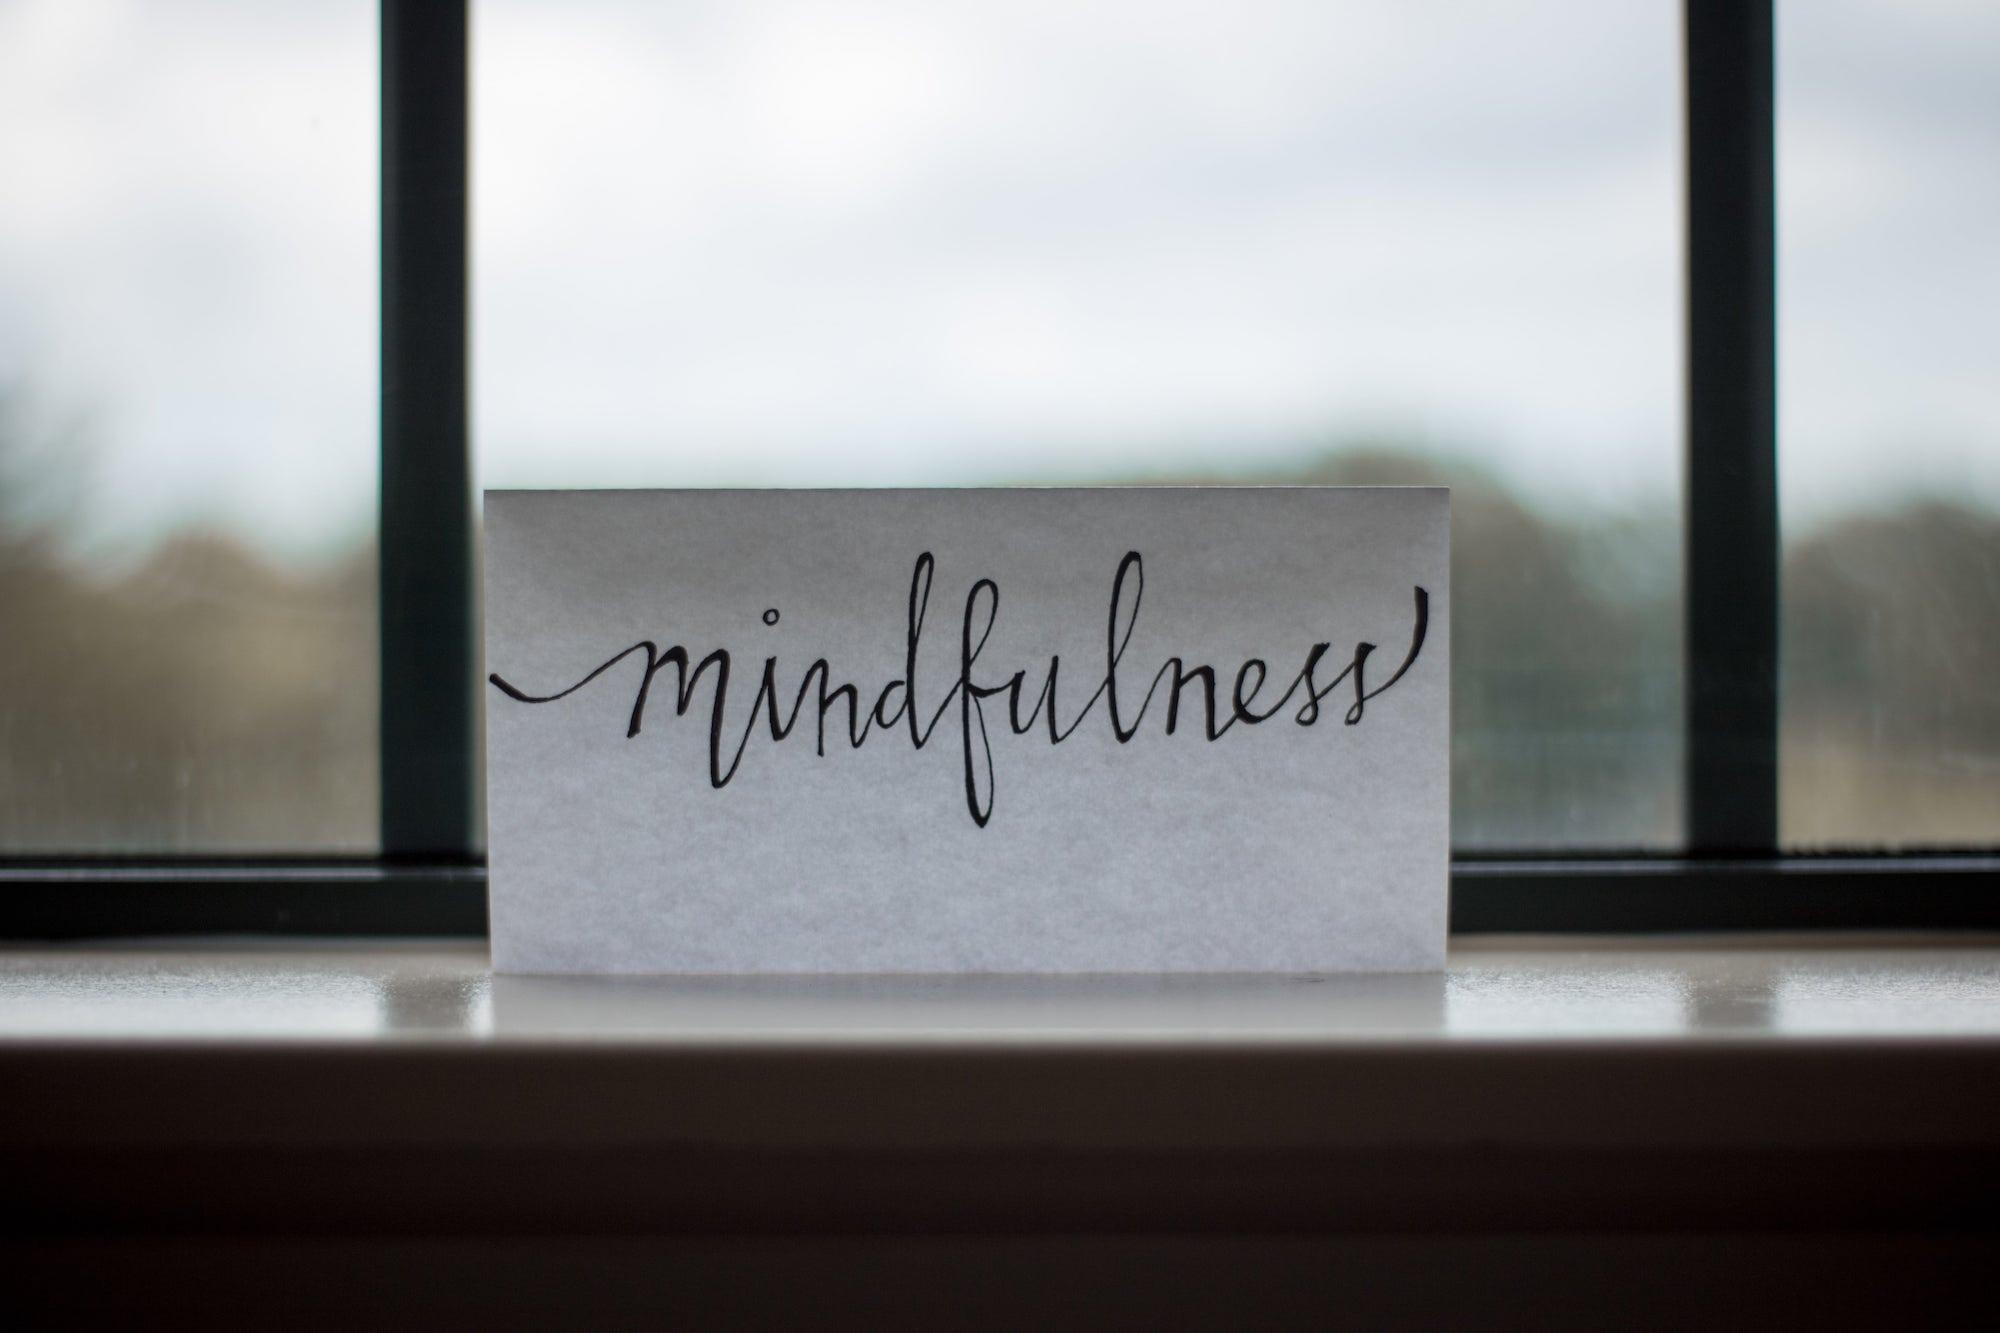 Mindfulness hidup sehat